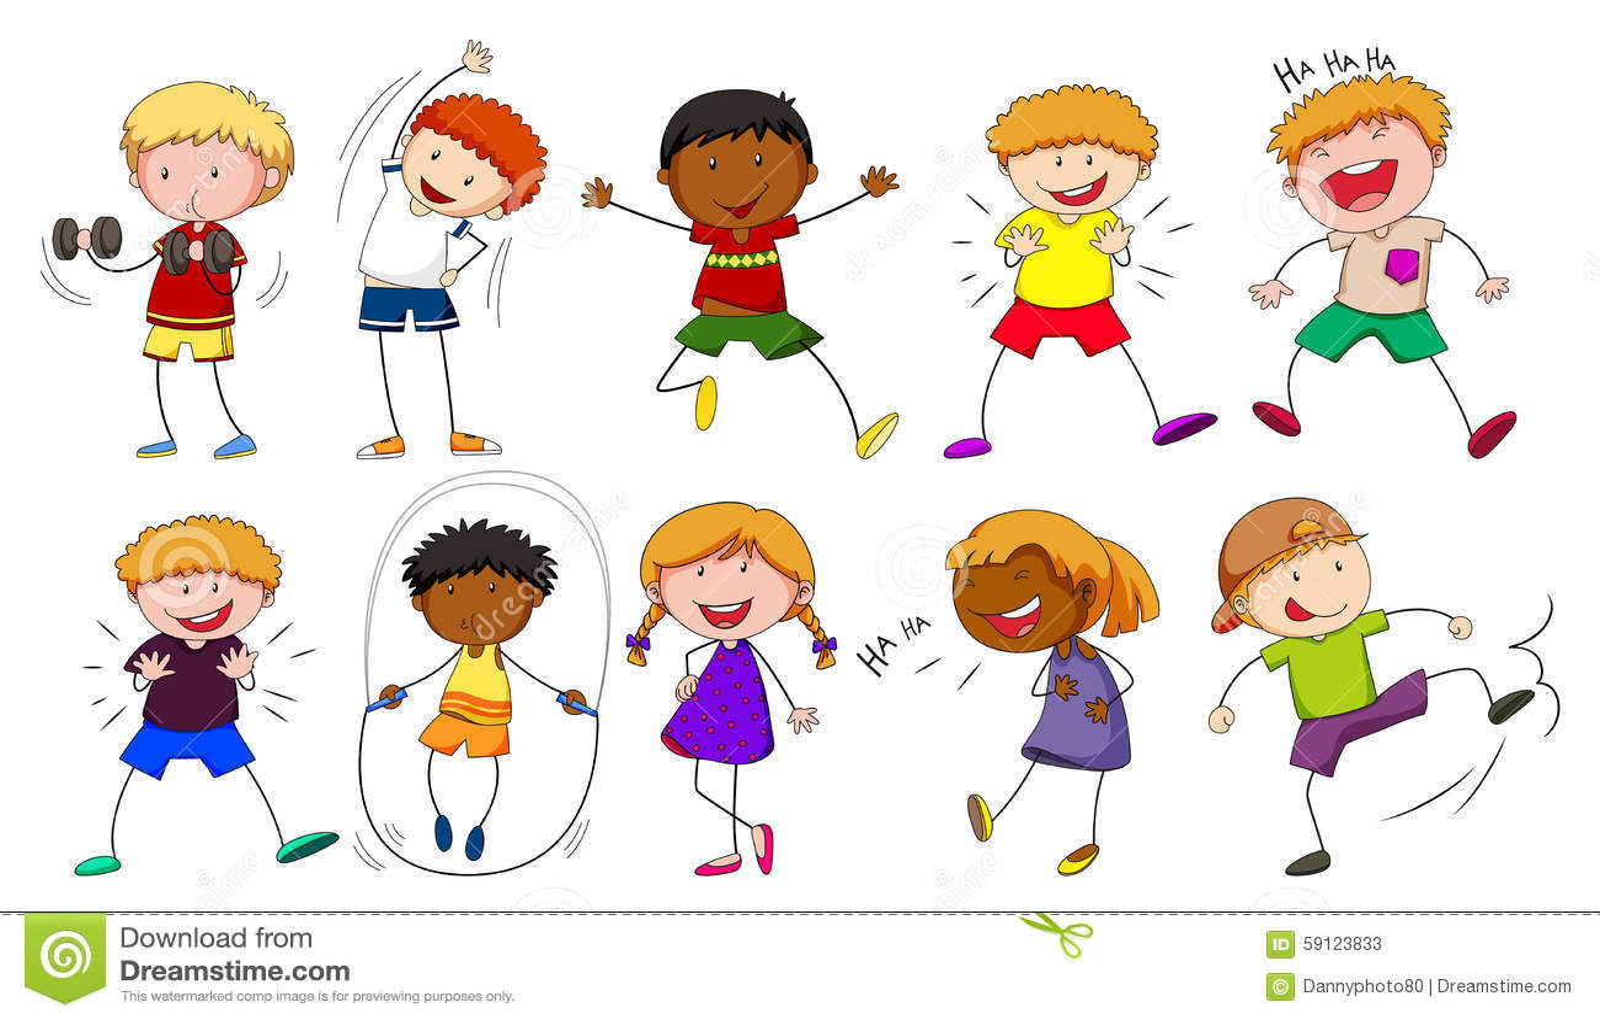 Meninos E Meninas De Nacionalidades Diferentes Childre: Meninos E Meninas Que Fazem Atividades Diferentes